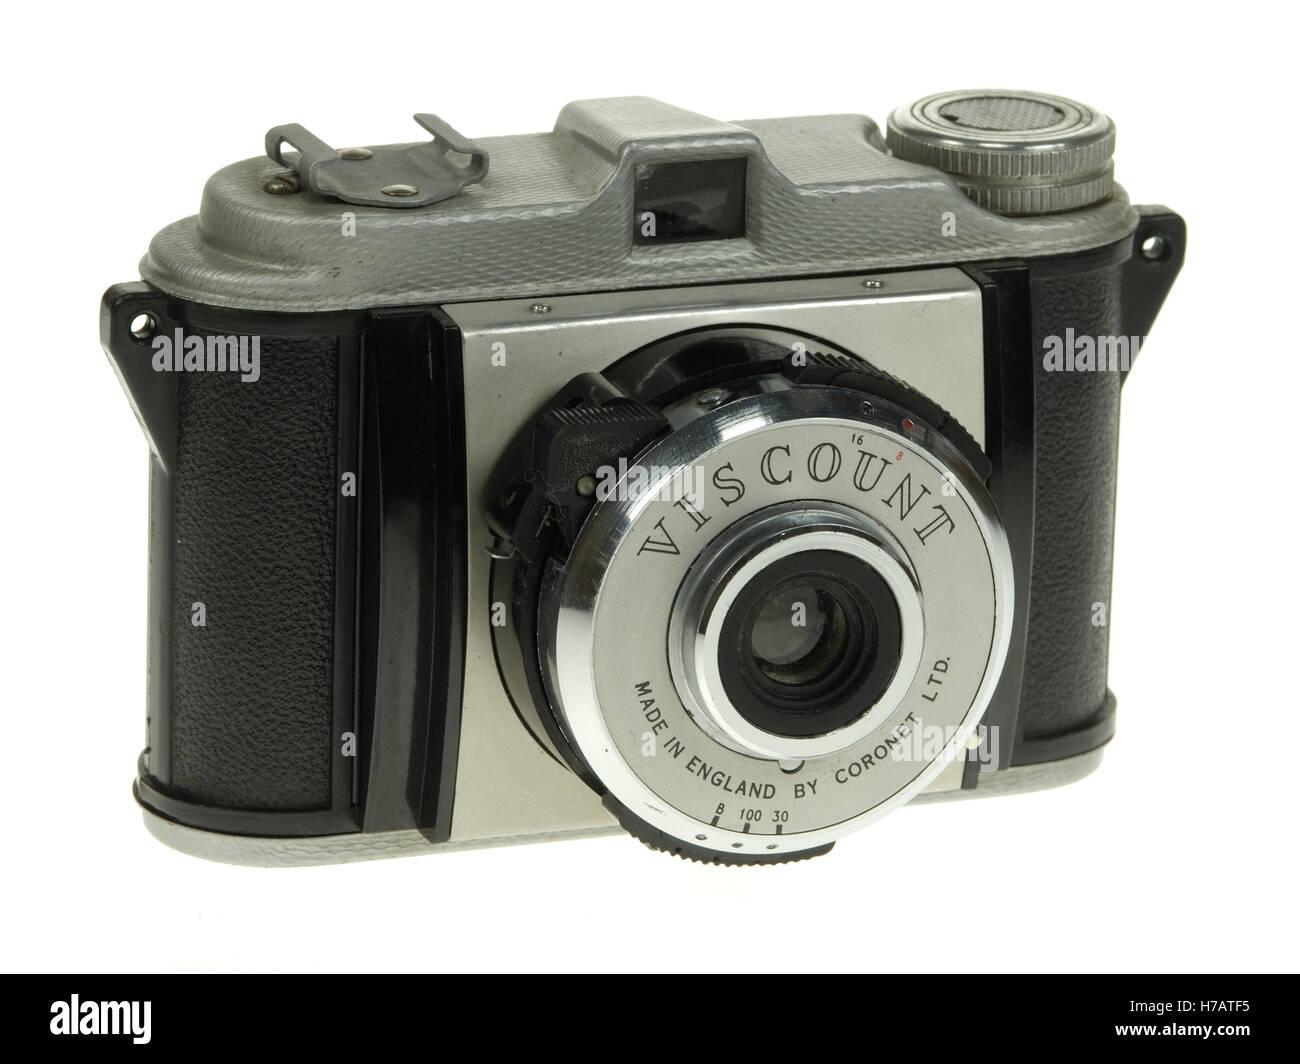 Coronet Viscount eye-level camera for 828 rollfilm. Stock Photo